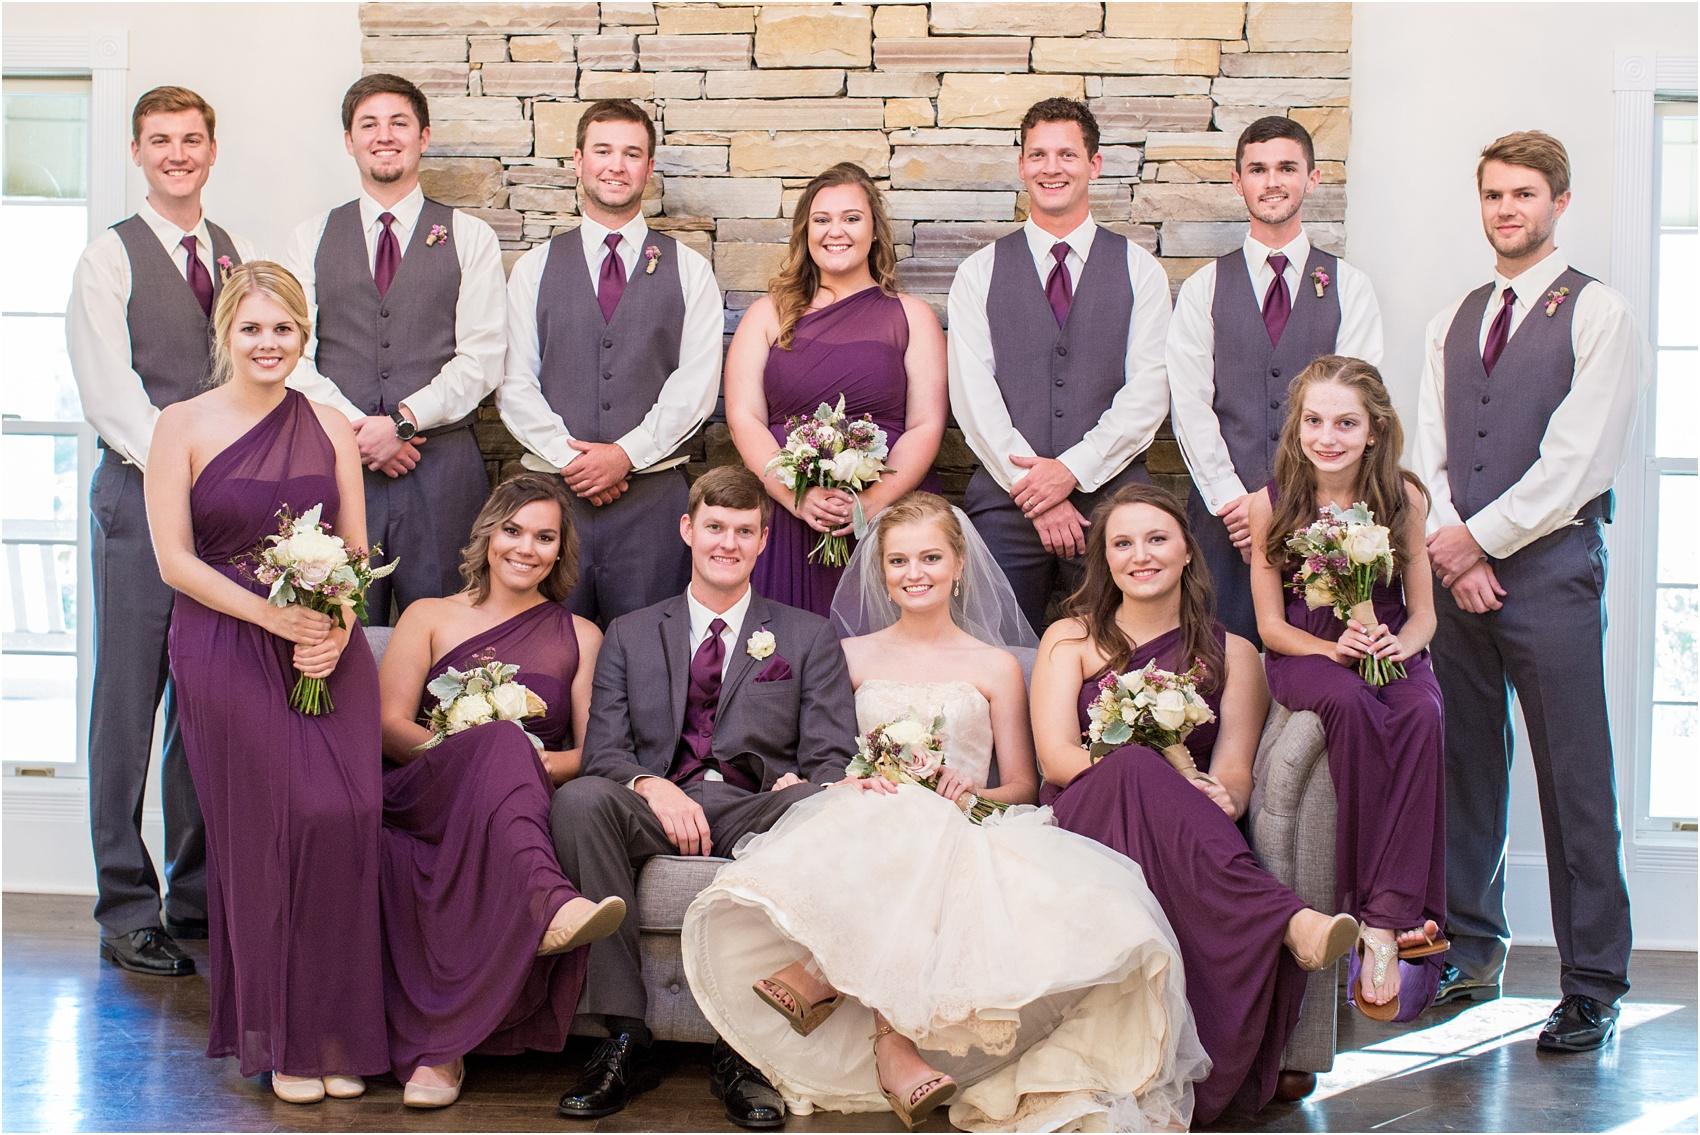 Savannah Eve Photography- Perkins Wedding- Blog-16.jpg